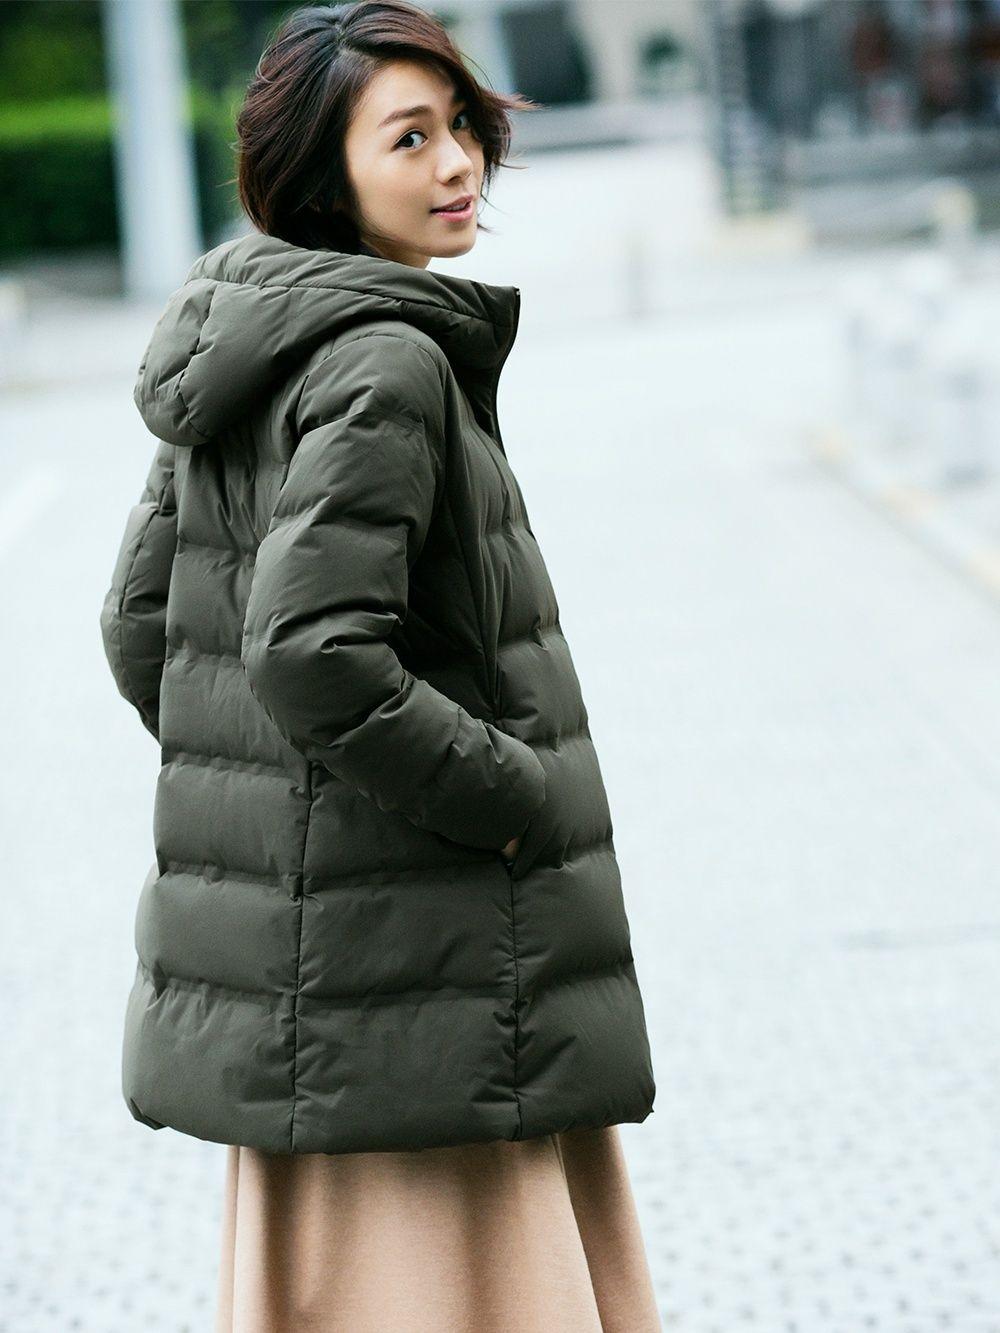 bccff5e15ba Women seamless down hooded short coat in 2019 | what to wear ...